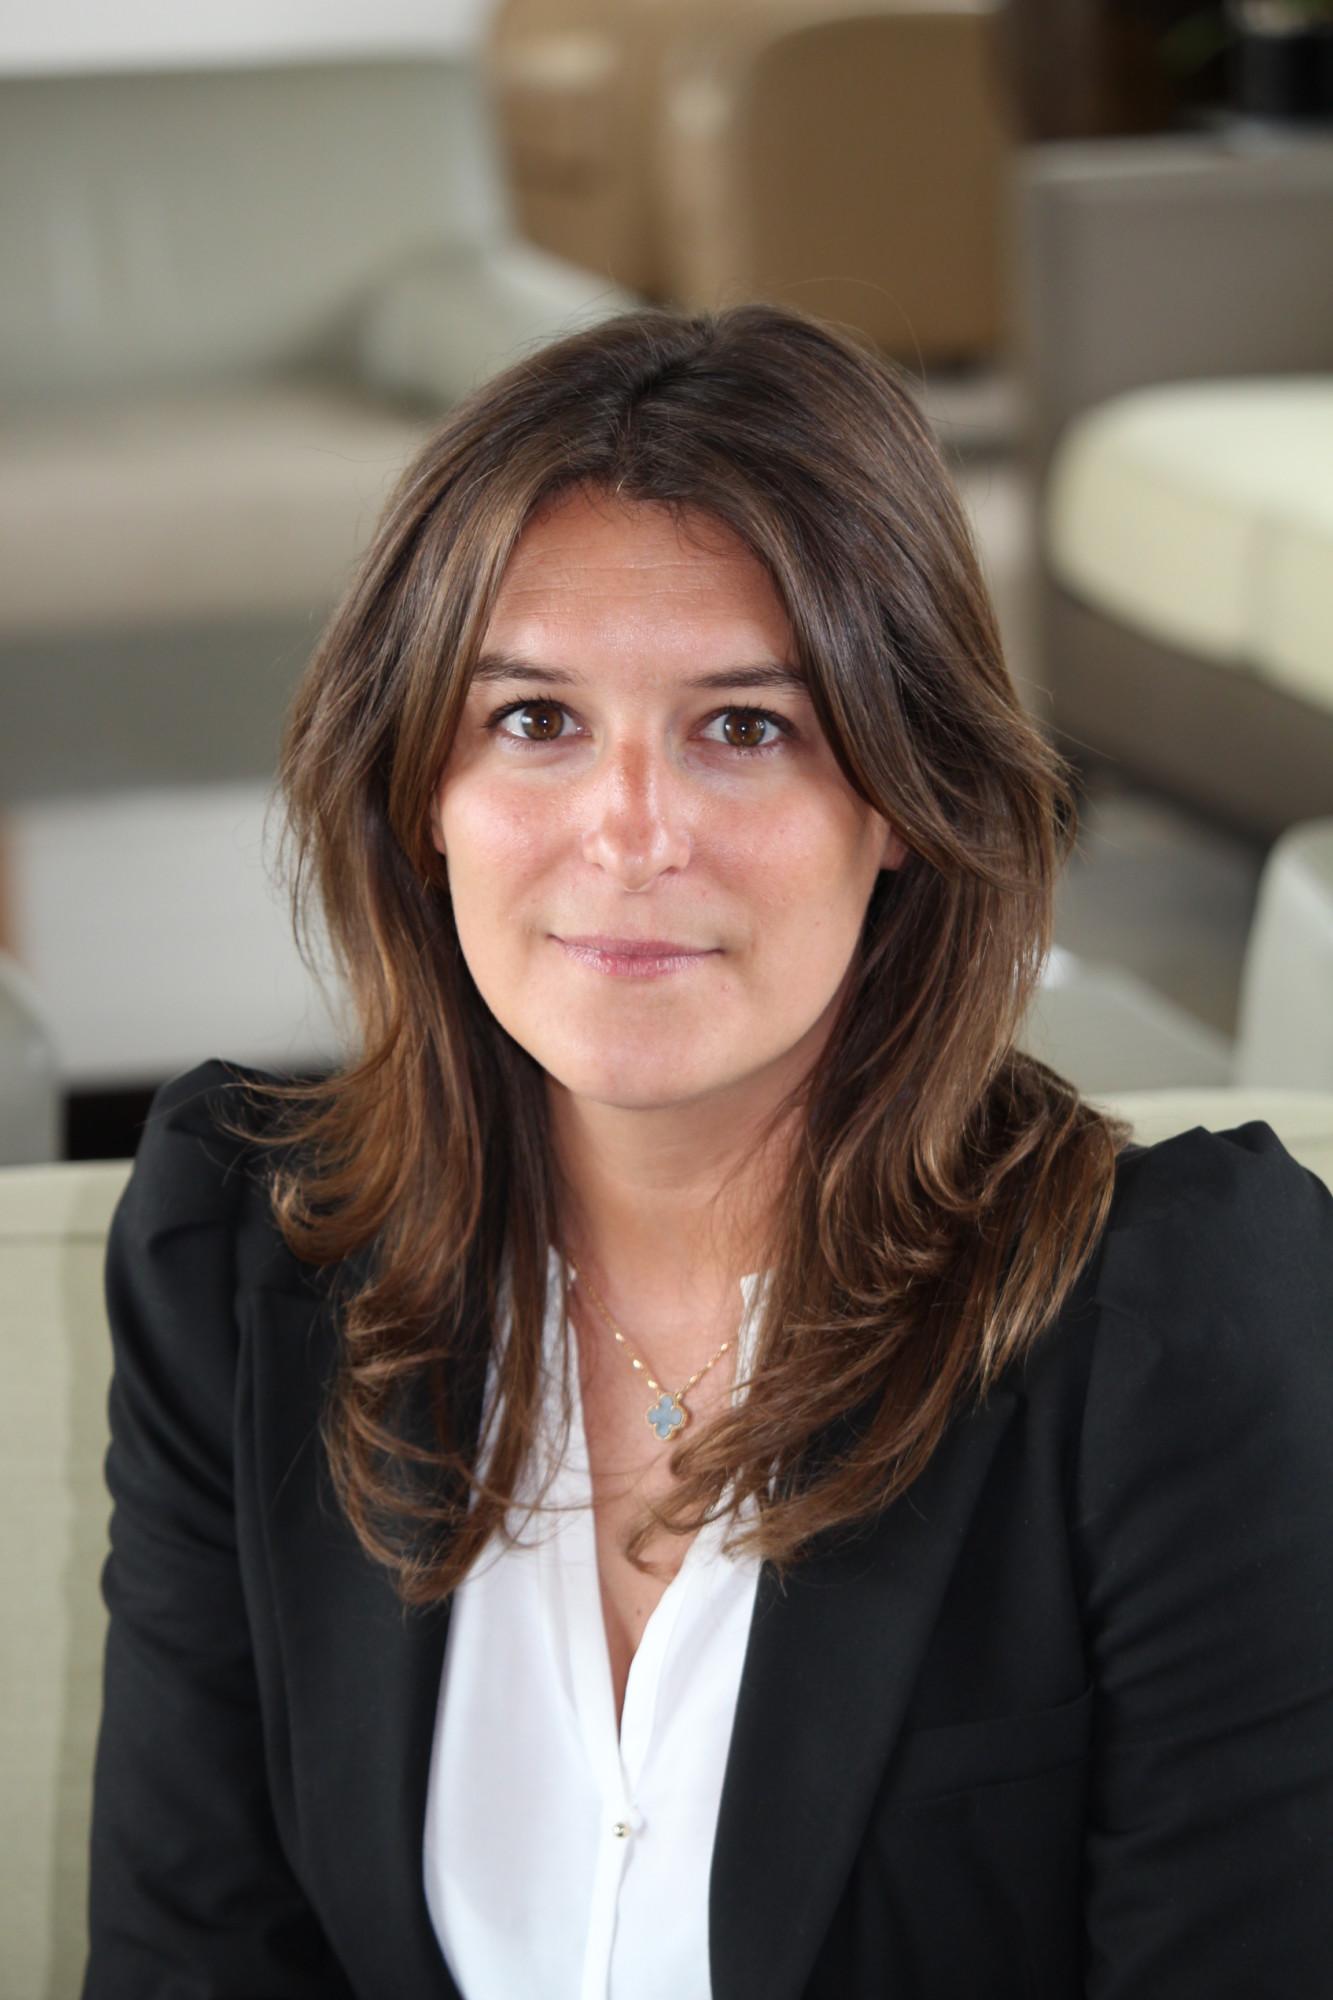 Isabelle Rouche